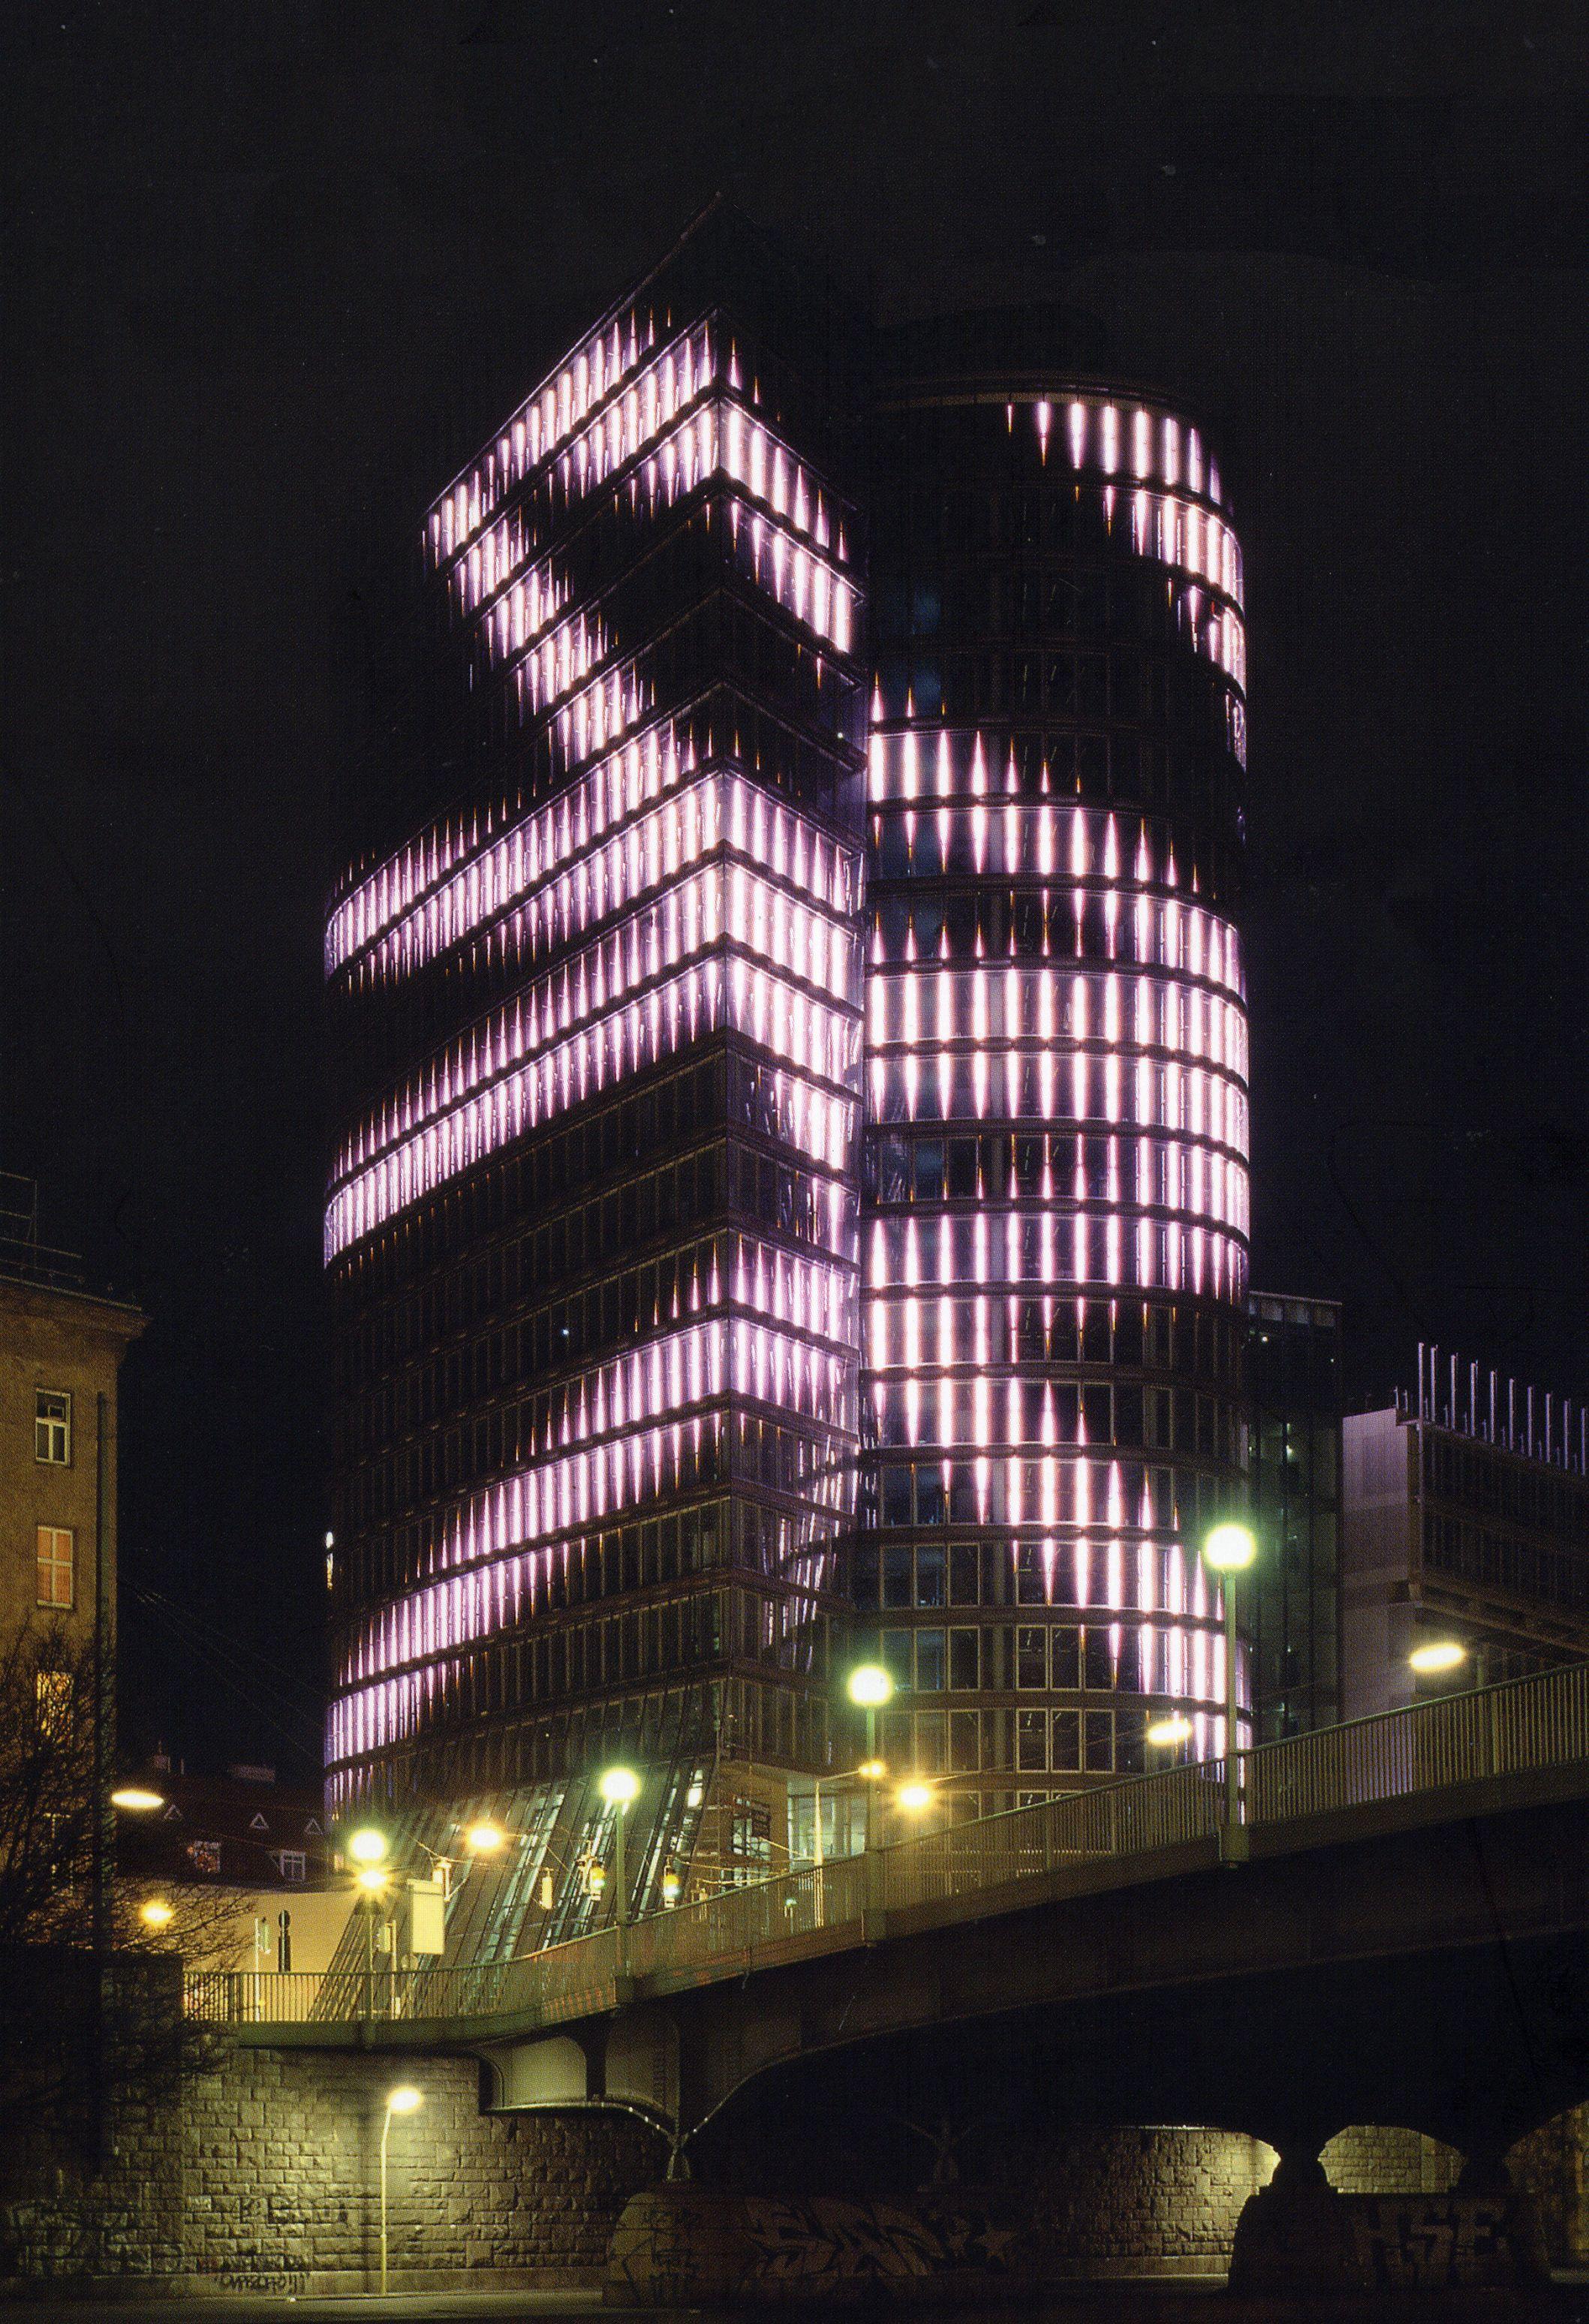 lime lights designs illumatecture led facade building facade lighting